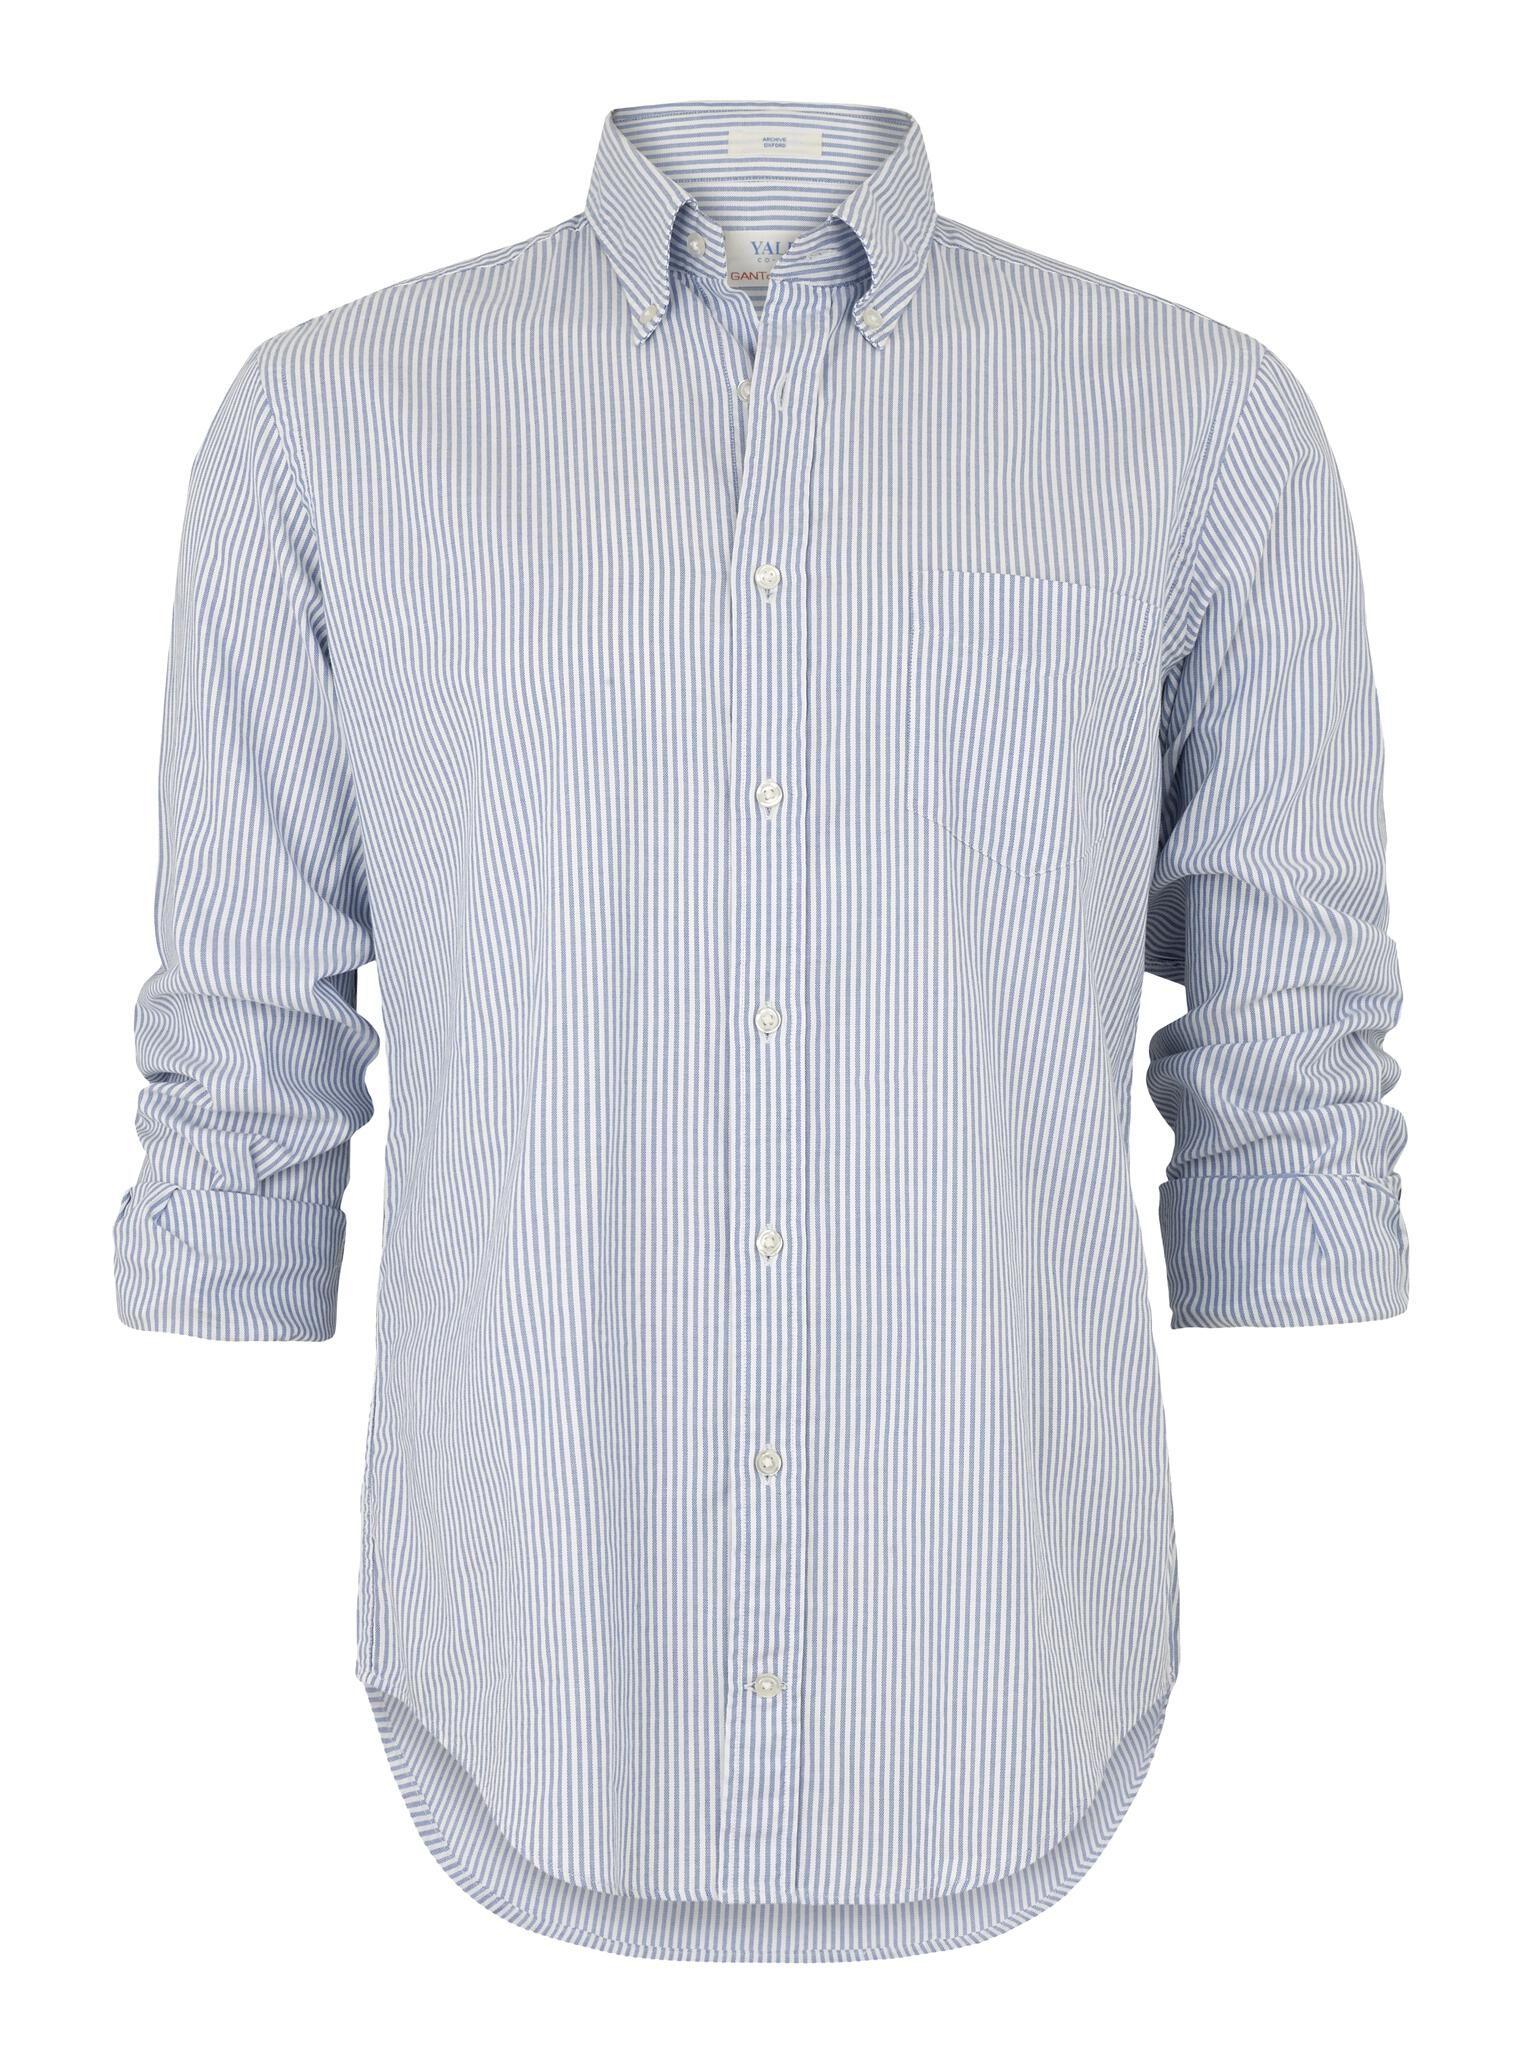 Gant Yale Archive Oxford Shirt